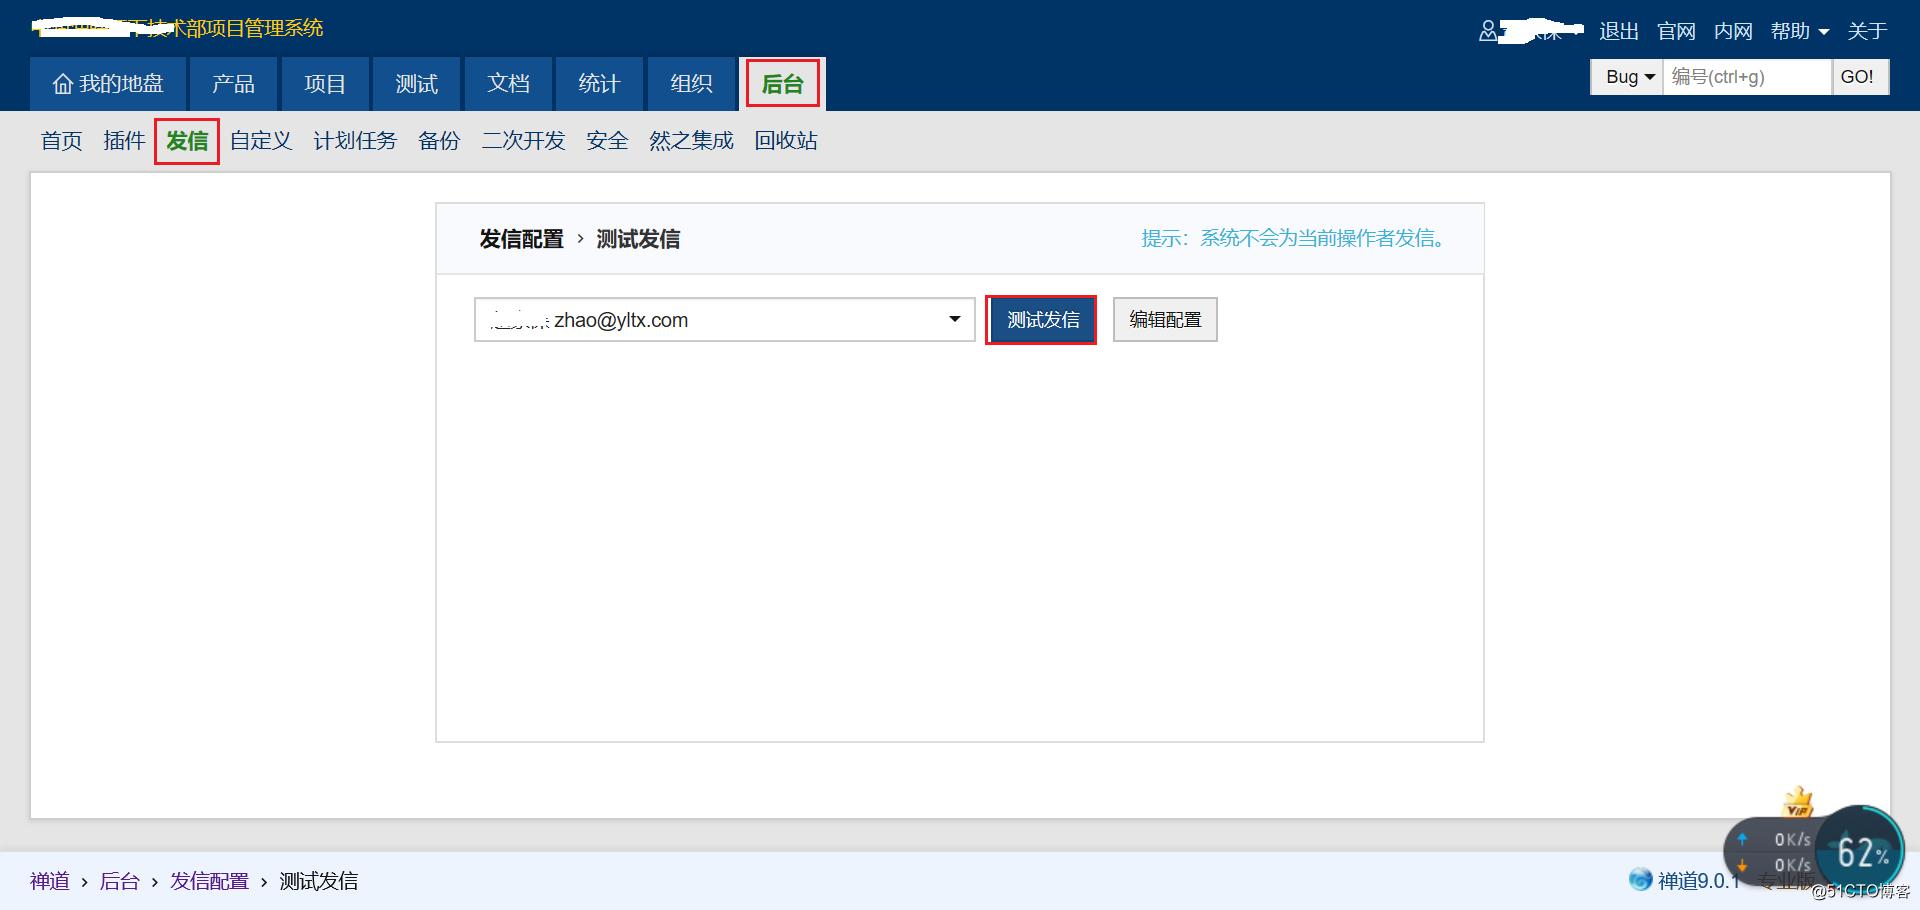 CentOS 7 安装禅道并绑定公司内网邮箱